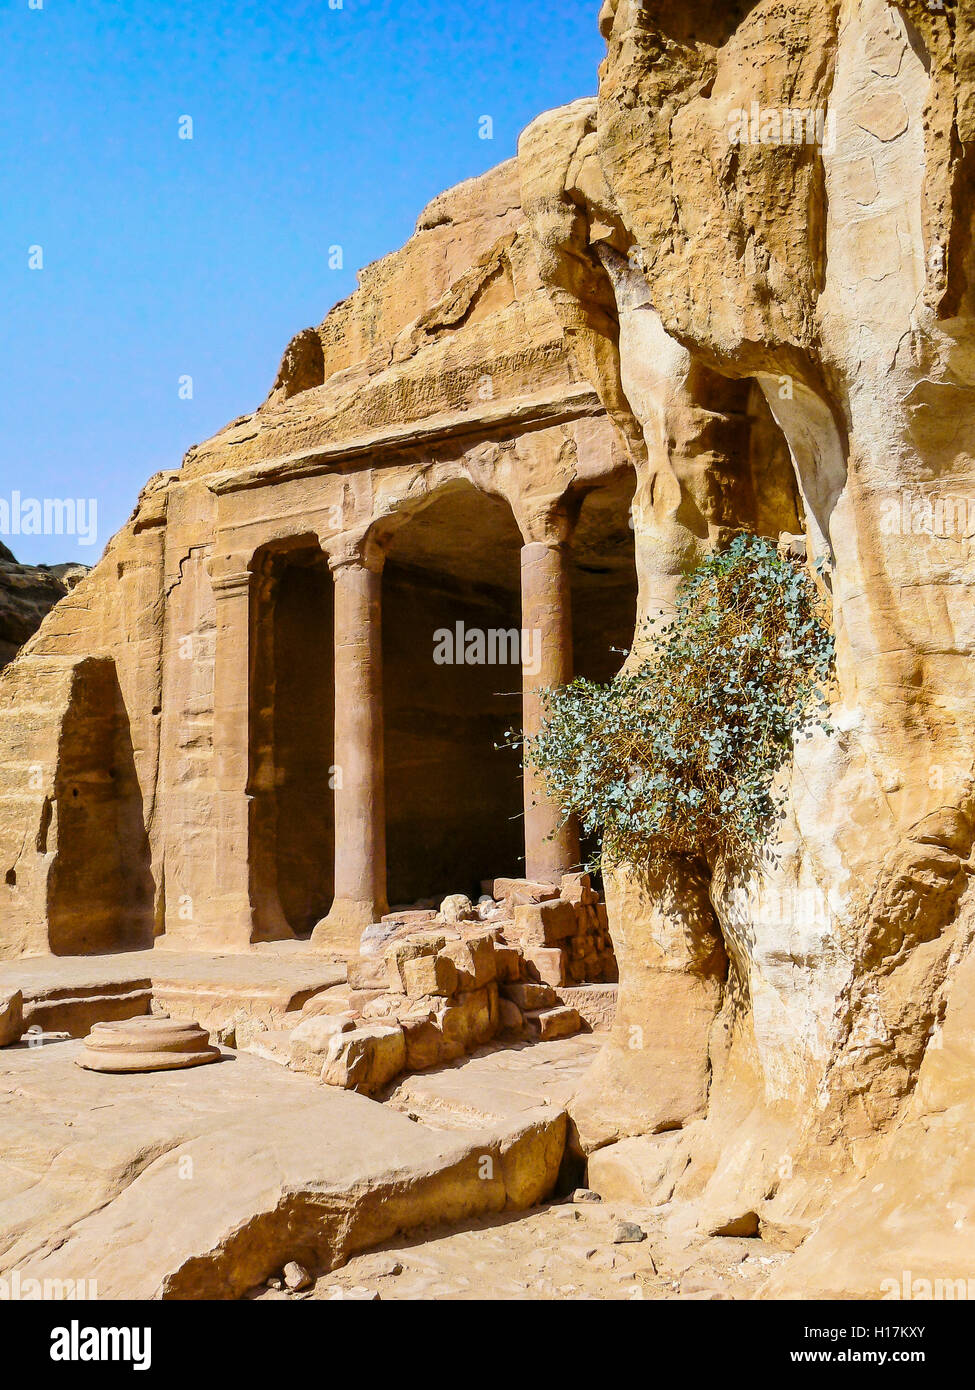 Tombes de Petra, Jordanie Banque D'Images